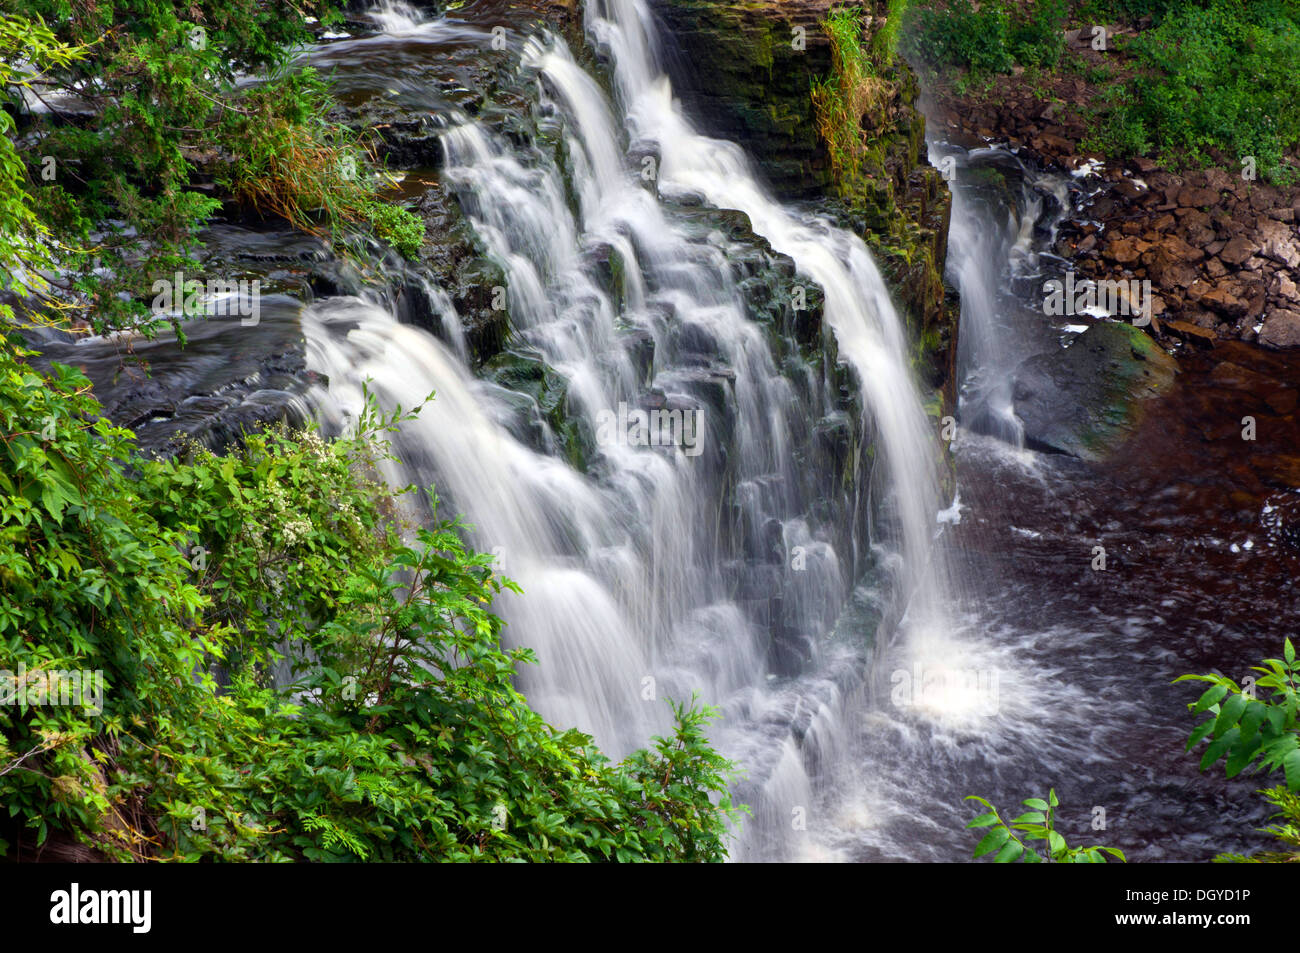 Waterfall, Bruce peninsula, Ontario, Canada - Stock Image